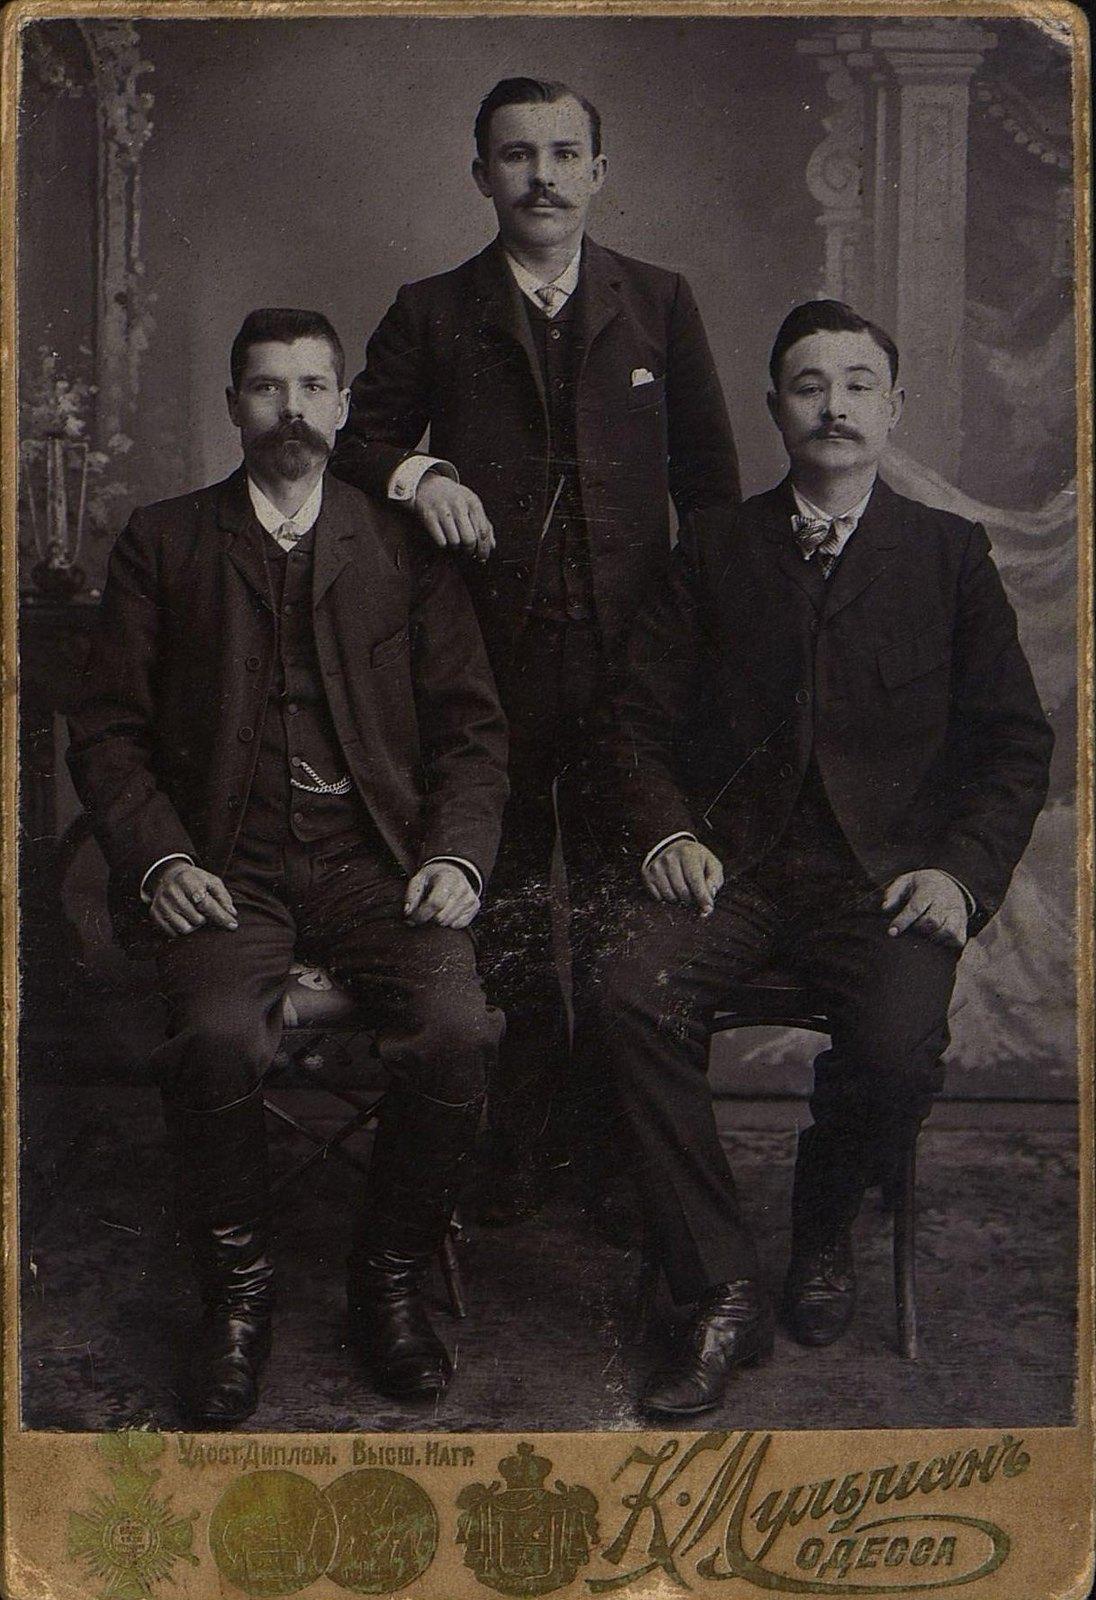 Домини Михаил, Нефёдов Александр и Гридин Иван Васильевич, рабочие-железнодорожники